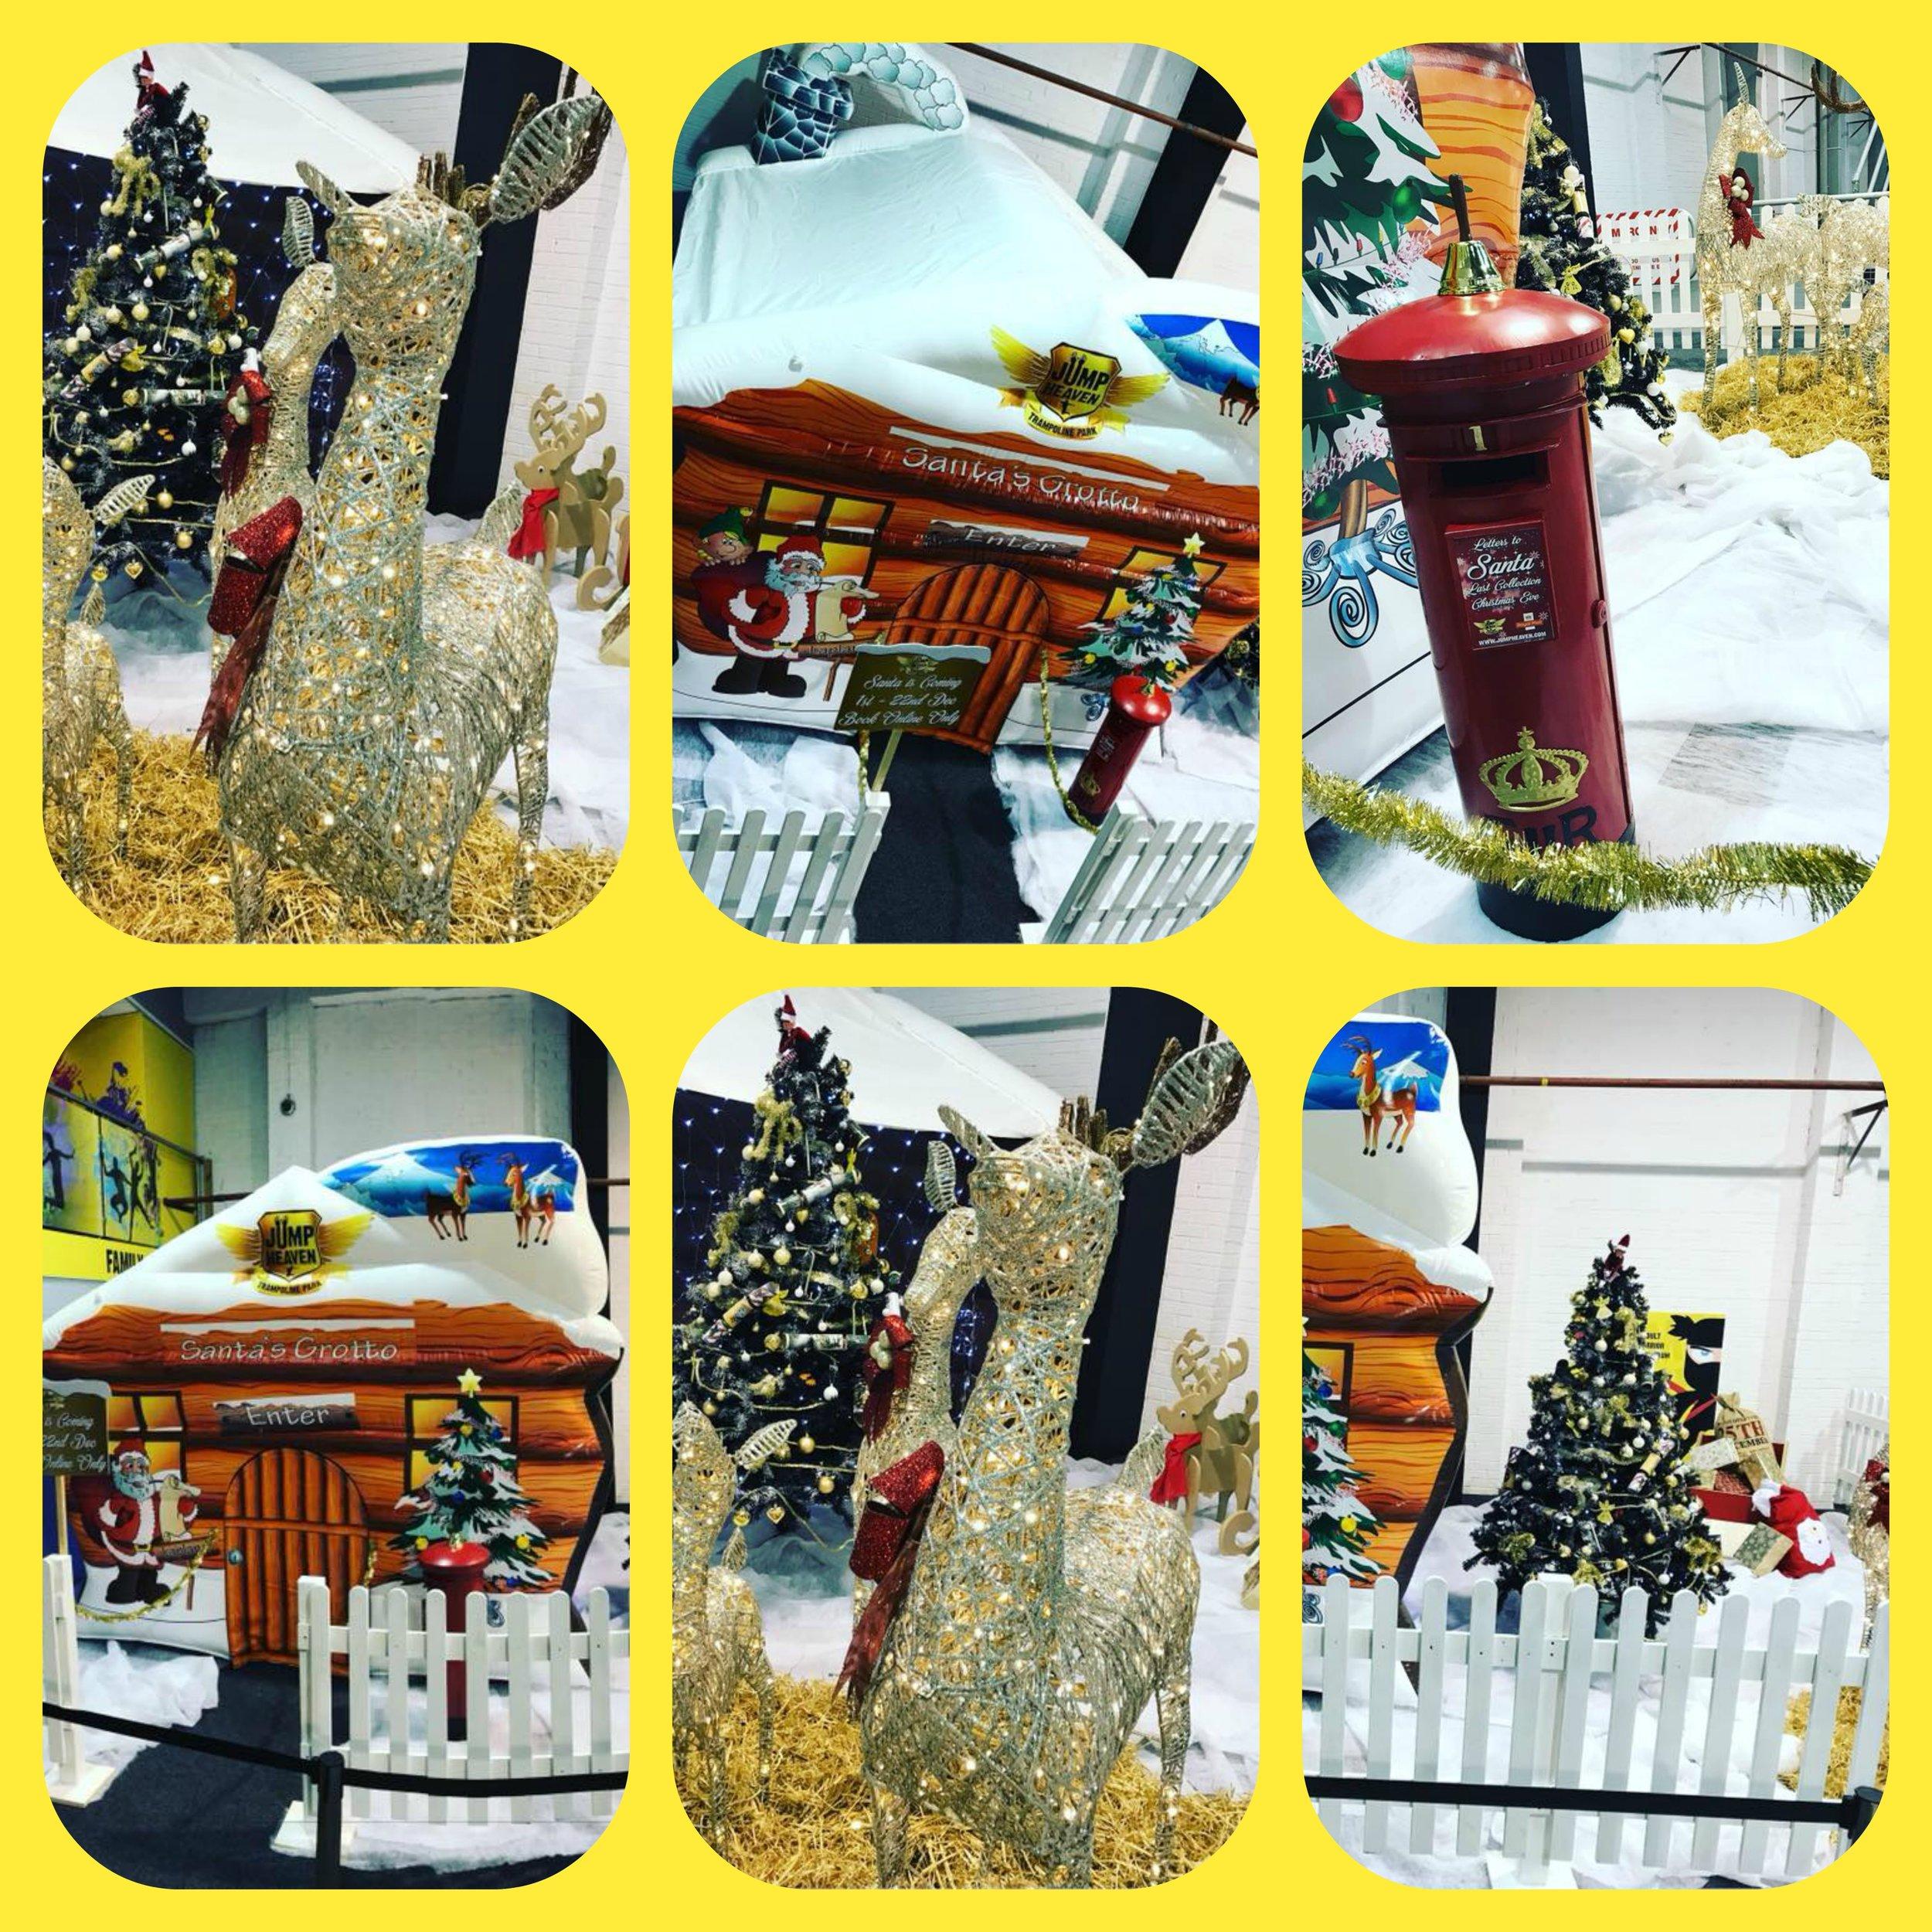 BeFunky Collage christmas grotto.jpg